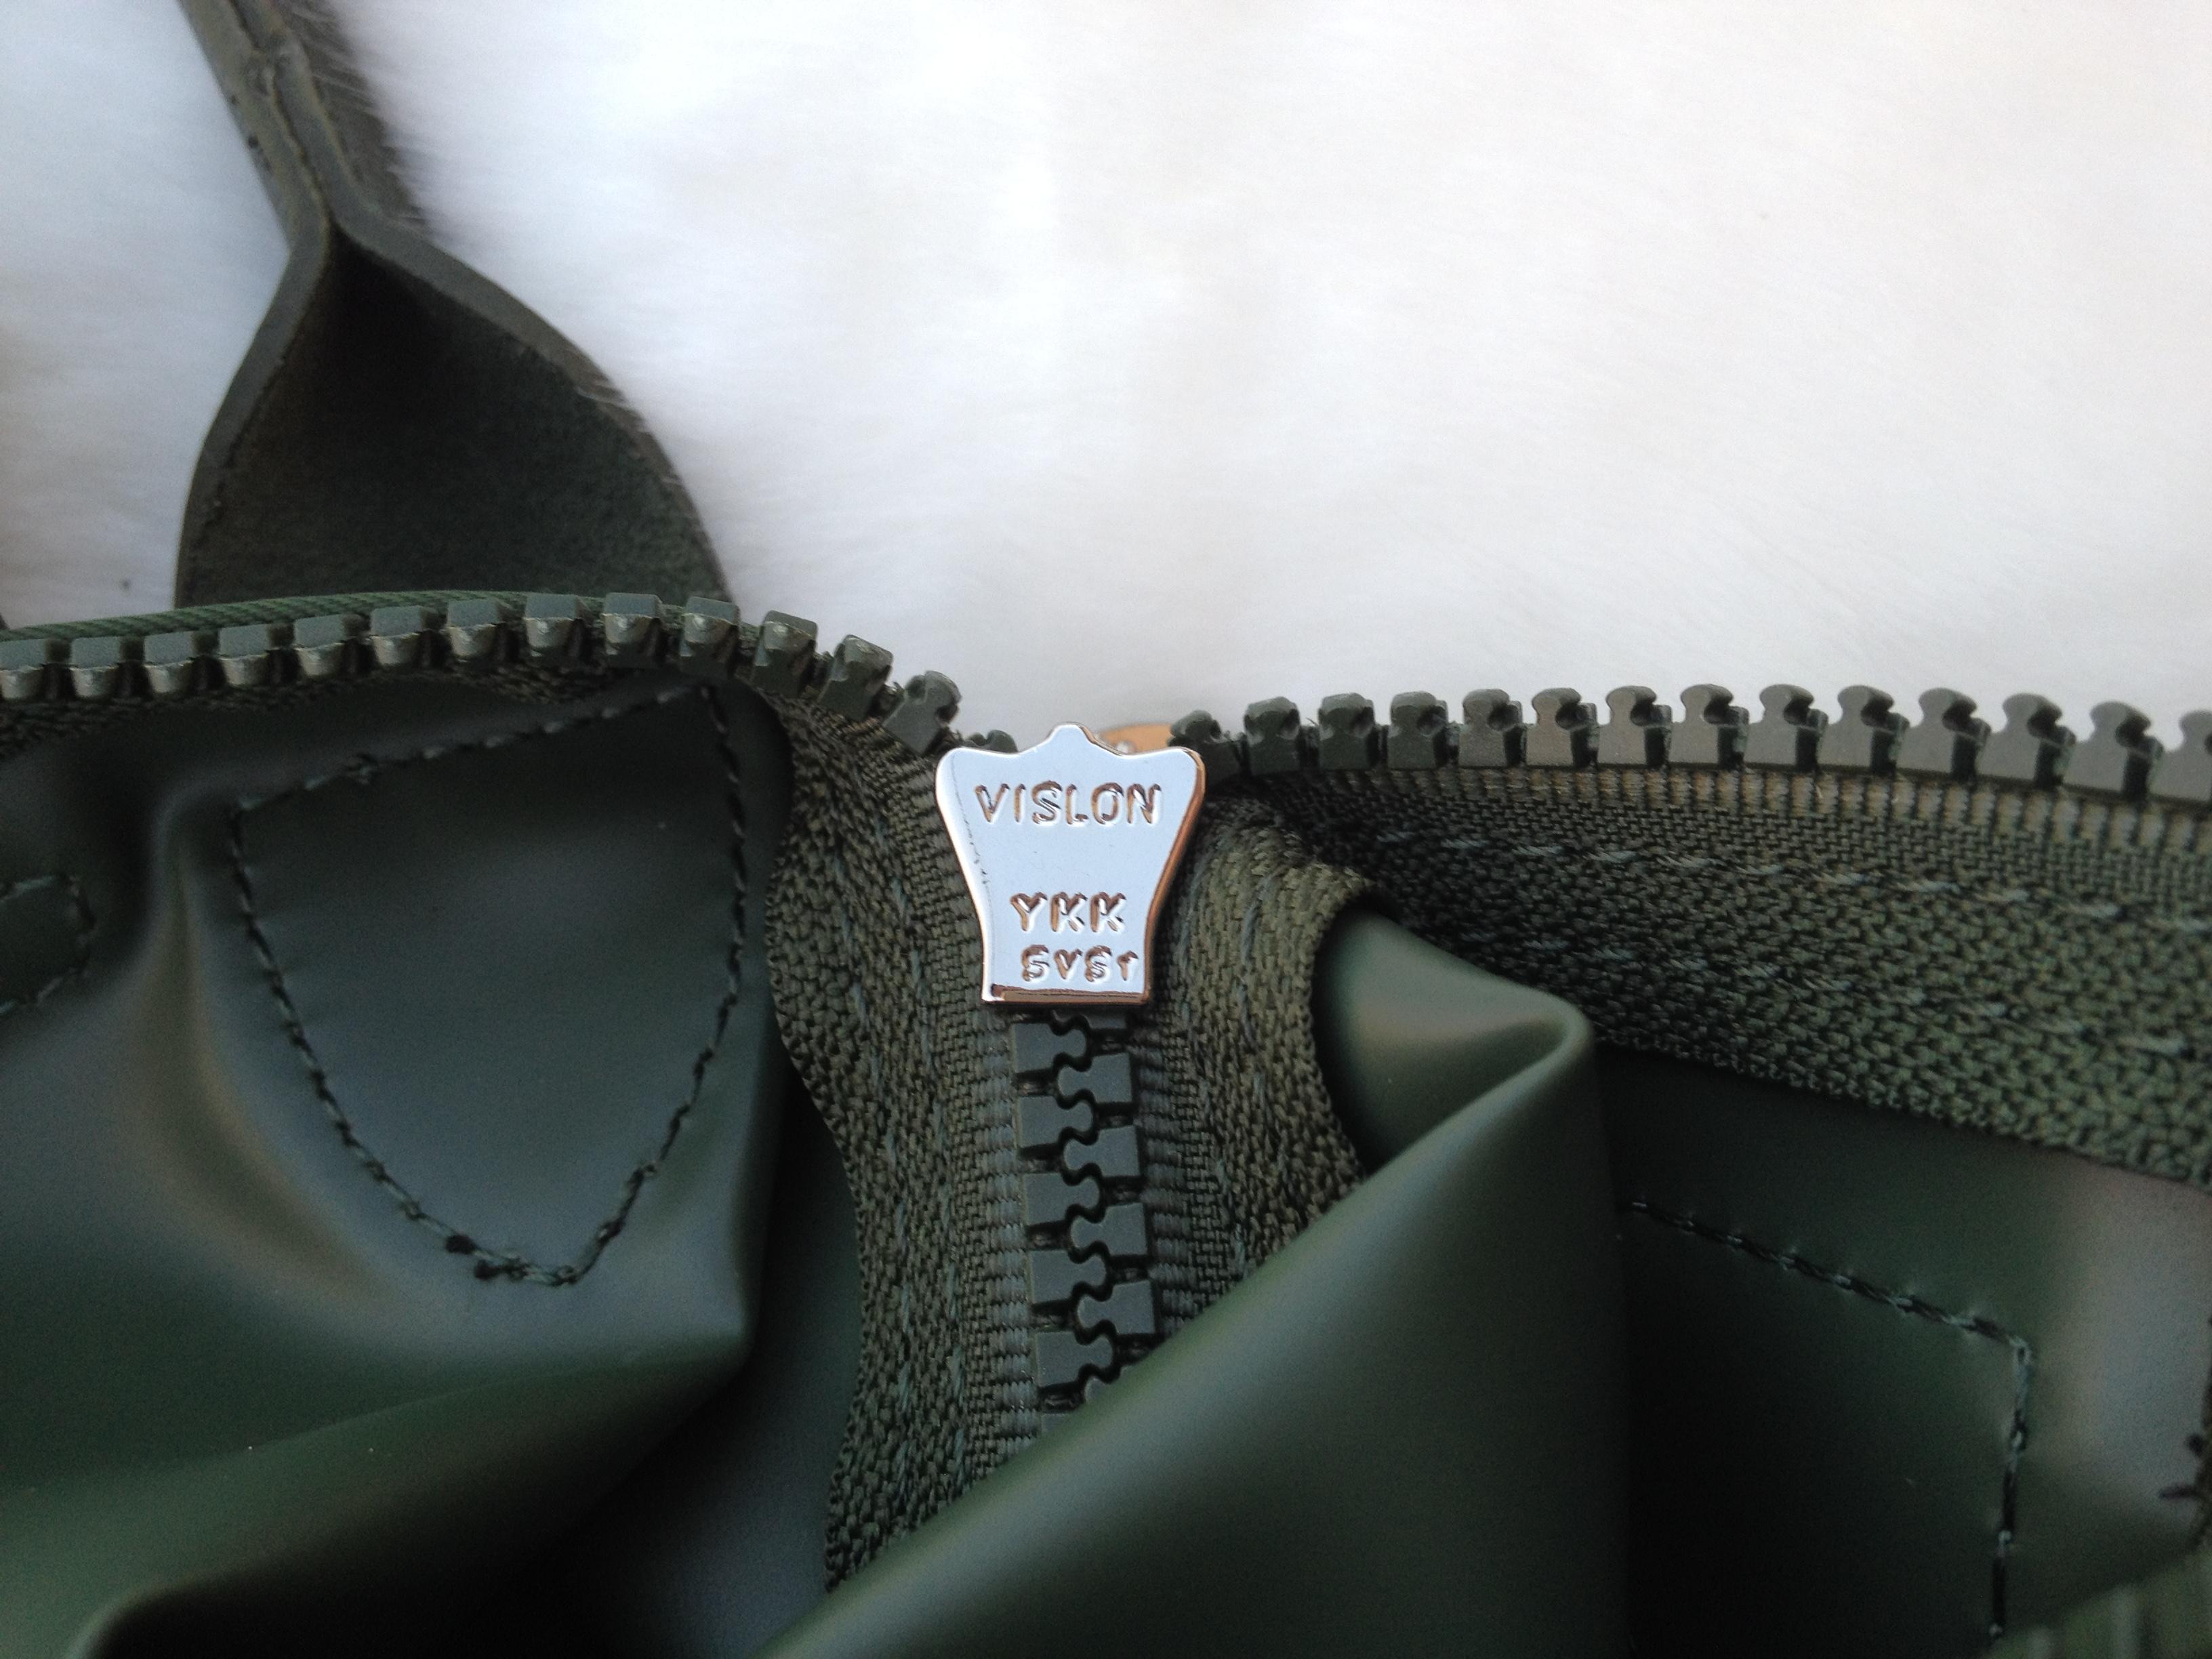 Authentic Longchamp Neo Medium Handbag Moss Green 1515578749 On Storenvy Black Img 5745 Small